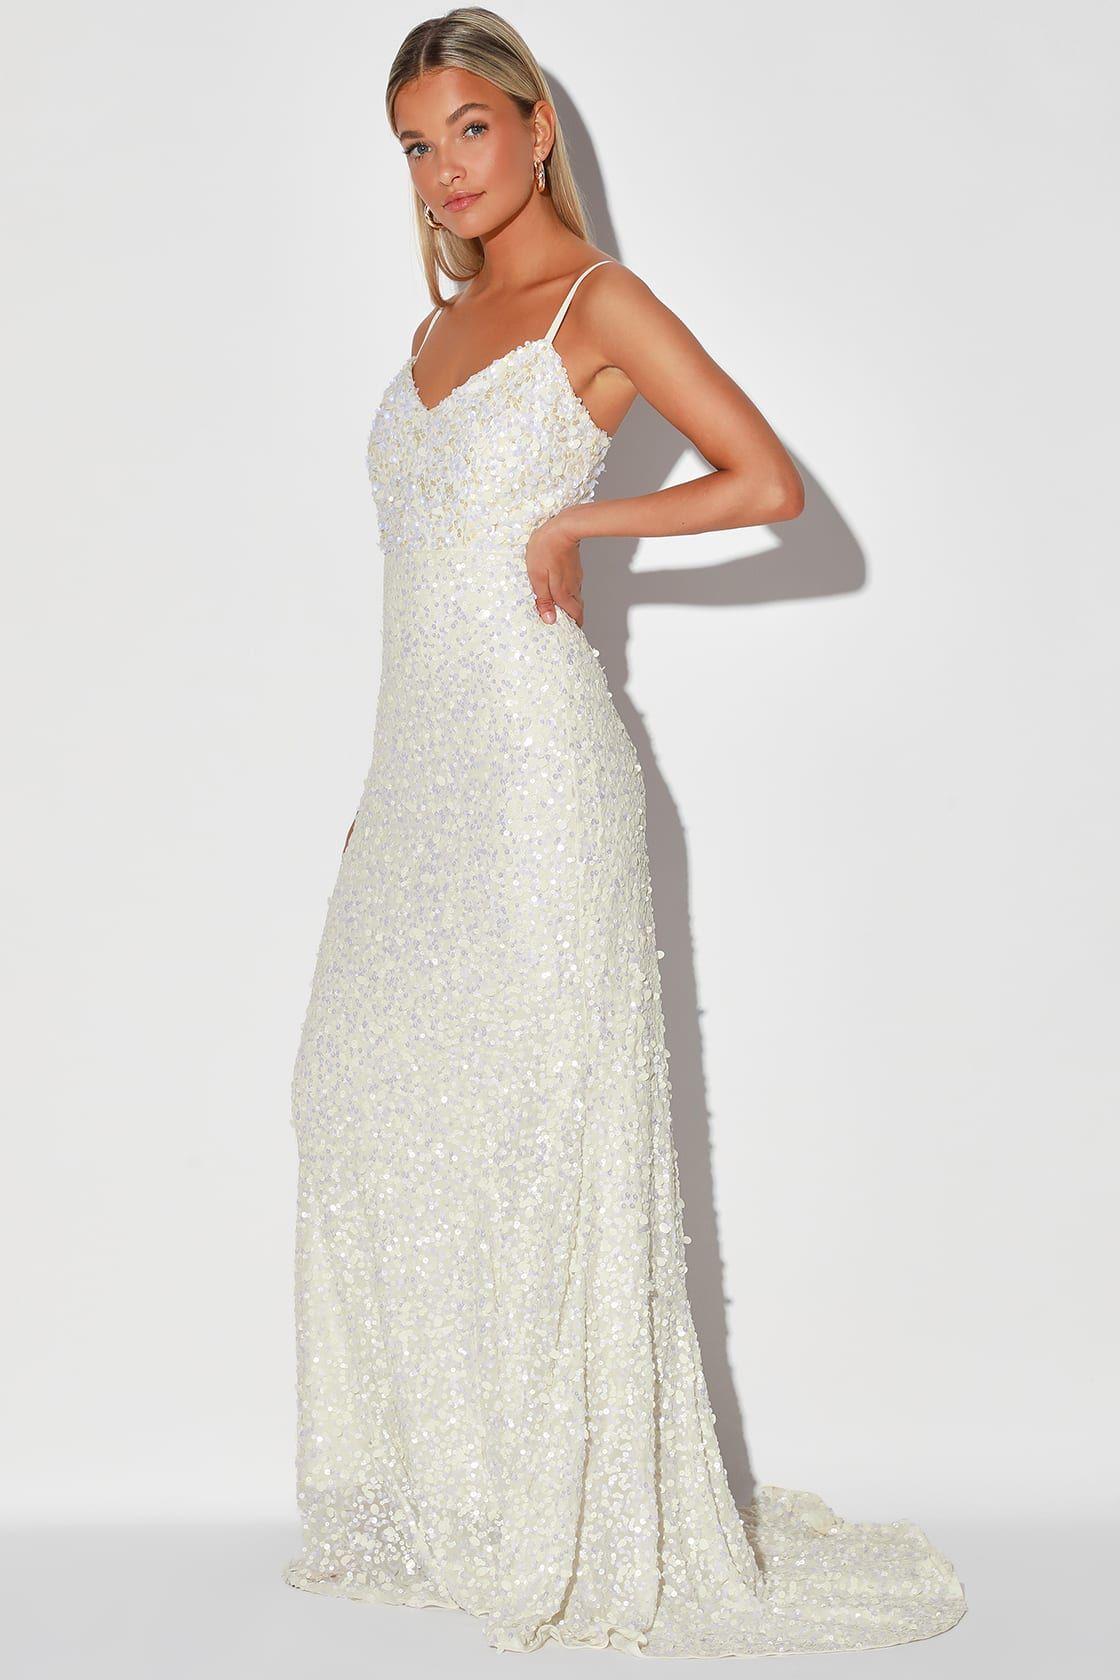 At Last White Sequin Mermaid Maxi Dress Wedding Dress Sequin Dresses Magenta Dress [ 1680 x 1120 Pixel ]